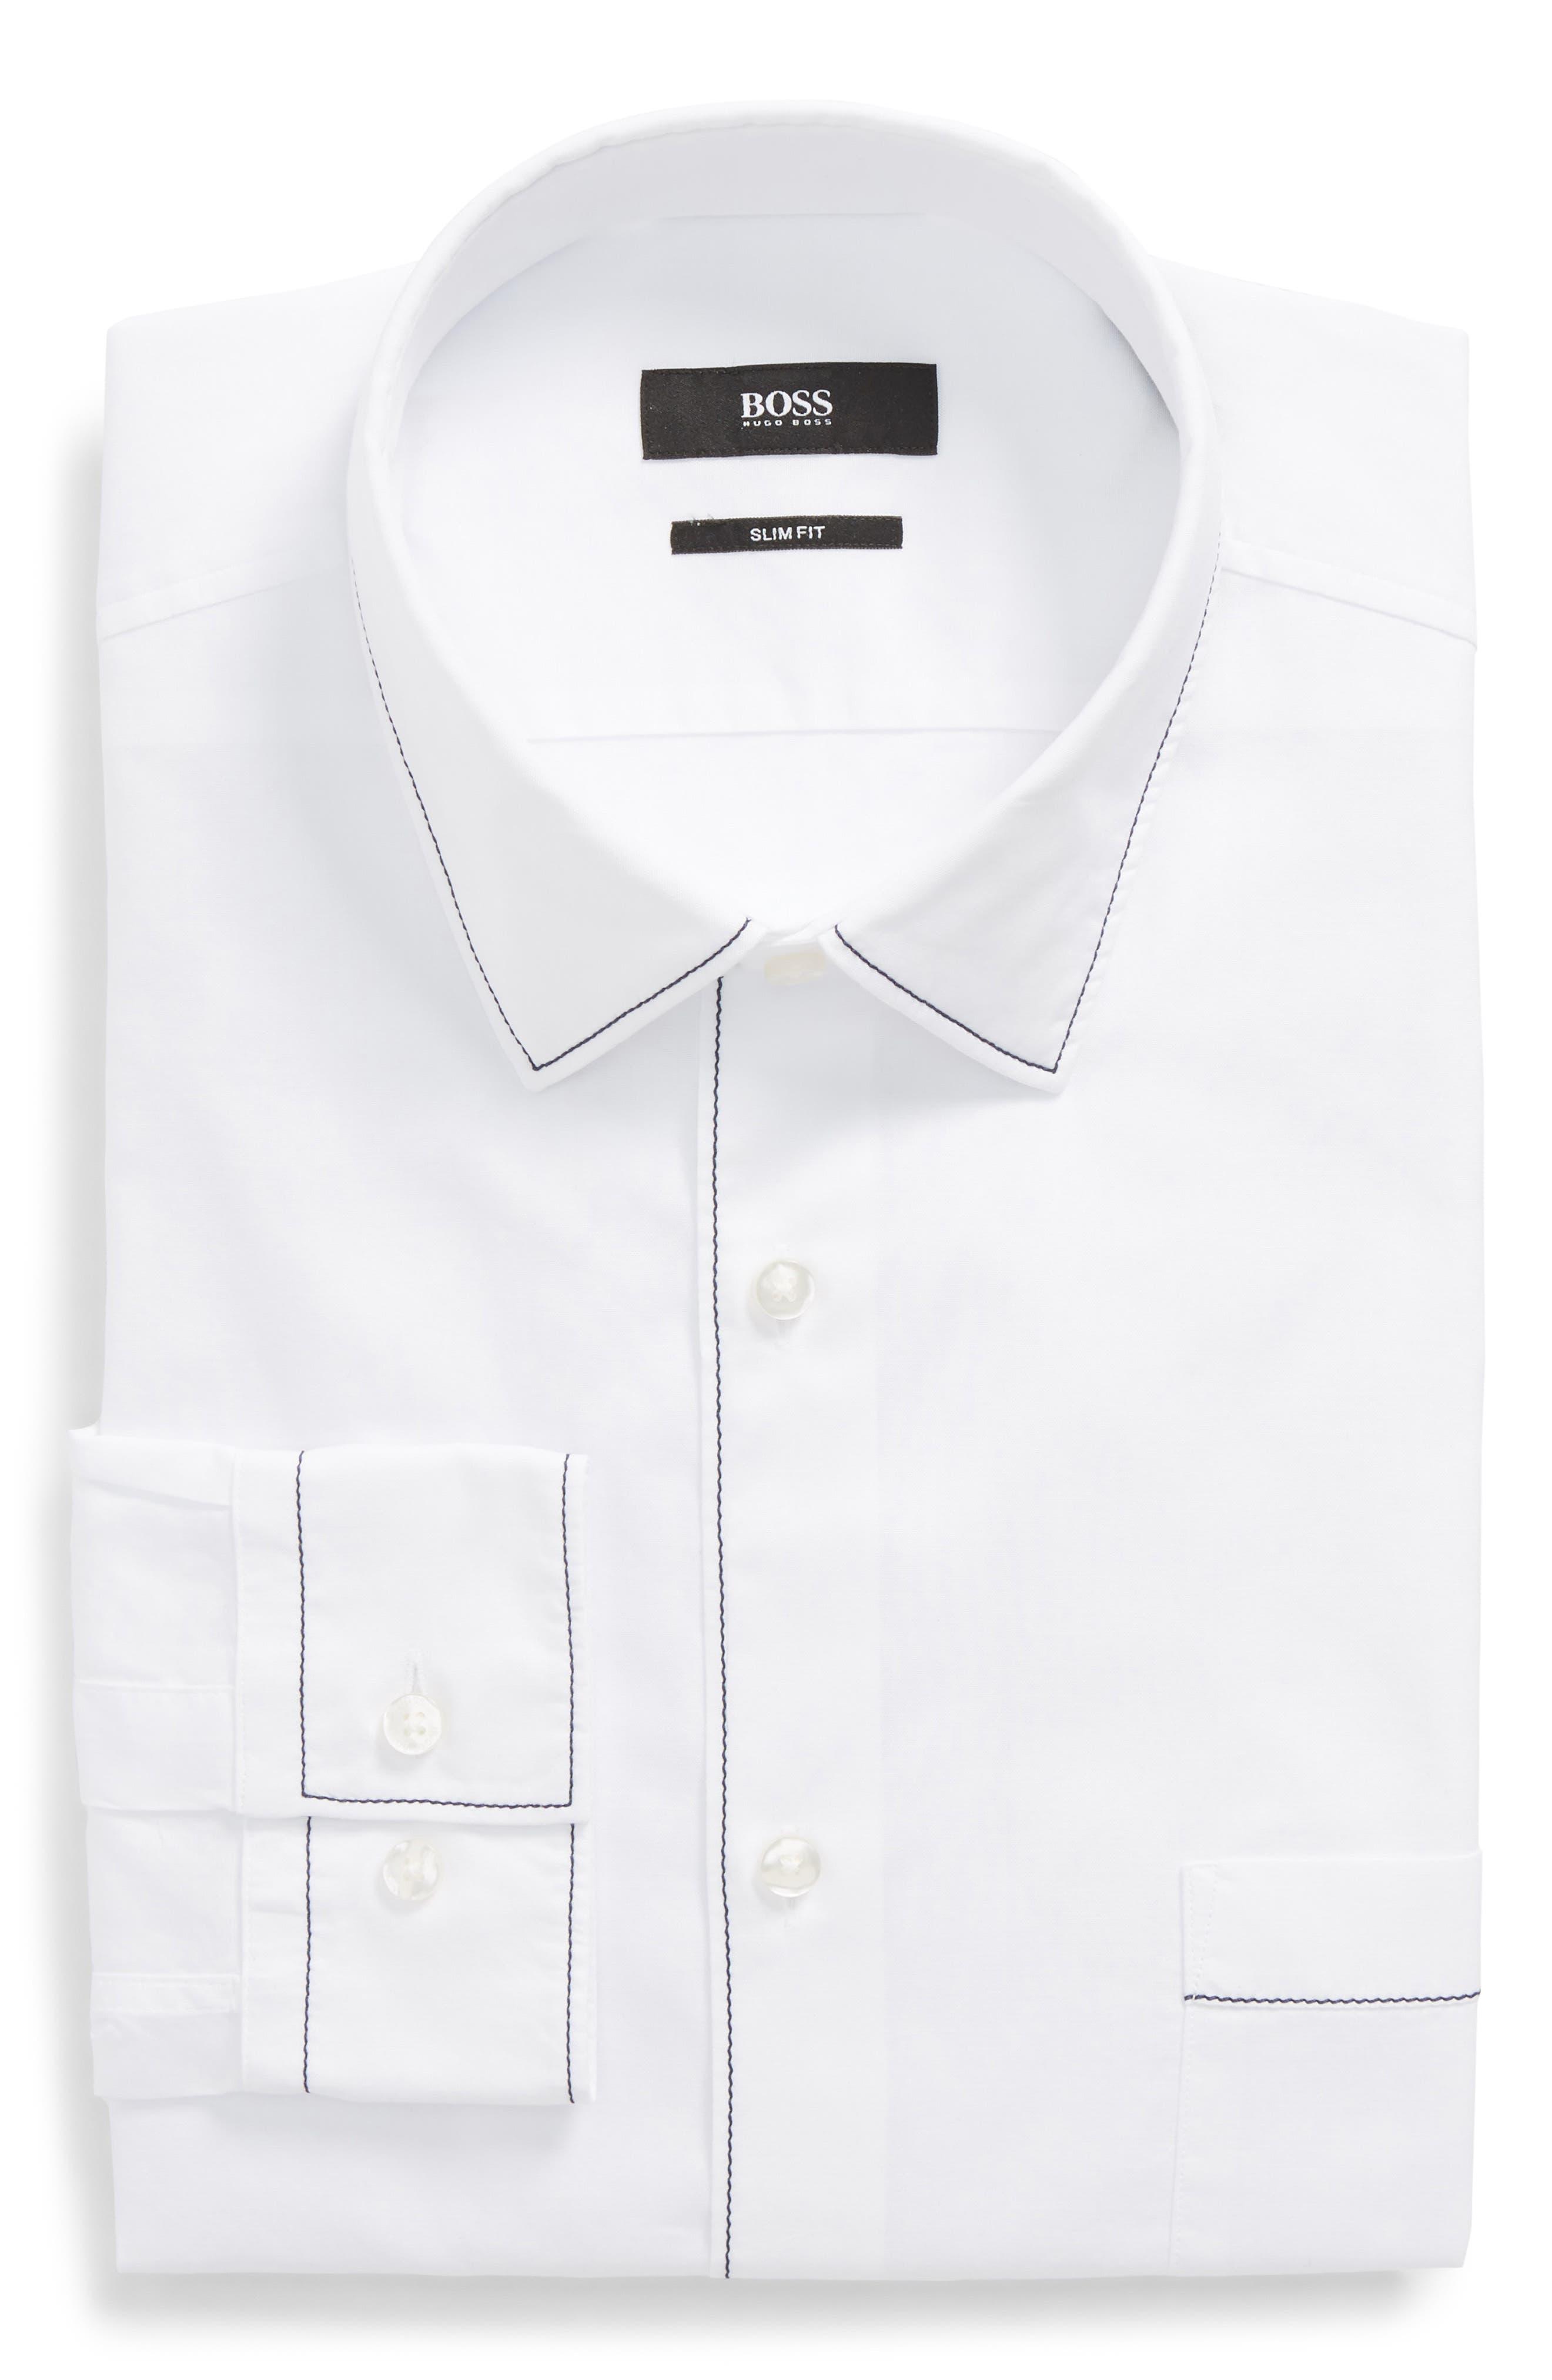 BOSS Jose Slim Fit Solid Dress Shirt